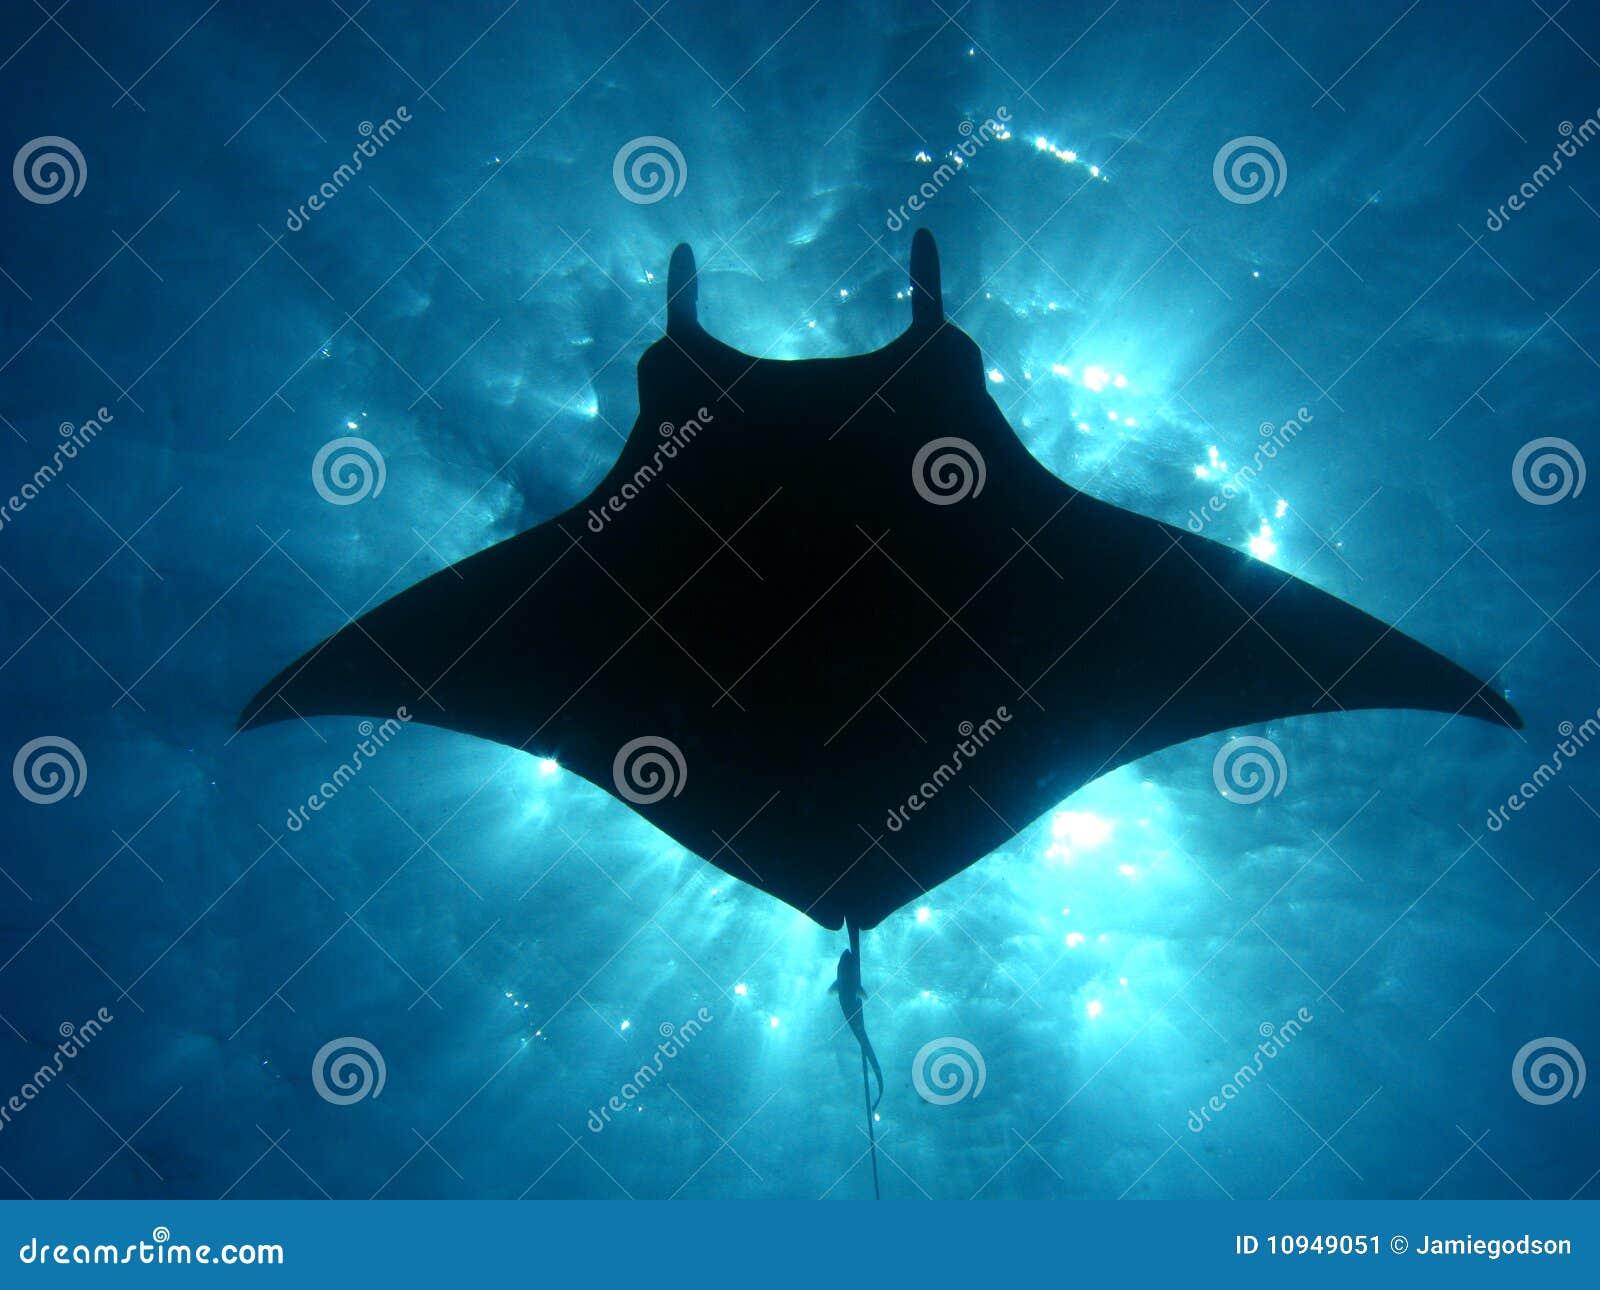 Download Manta ray sunburst stock image. Image of flying, light - 10949051